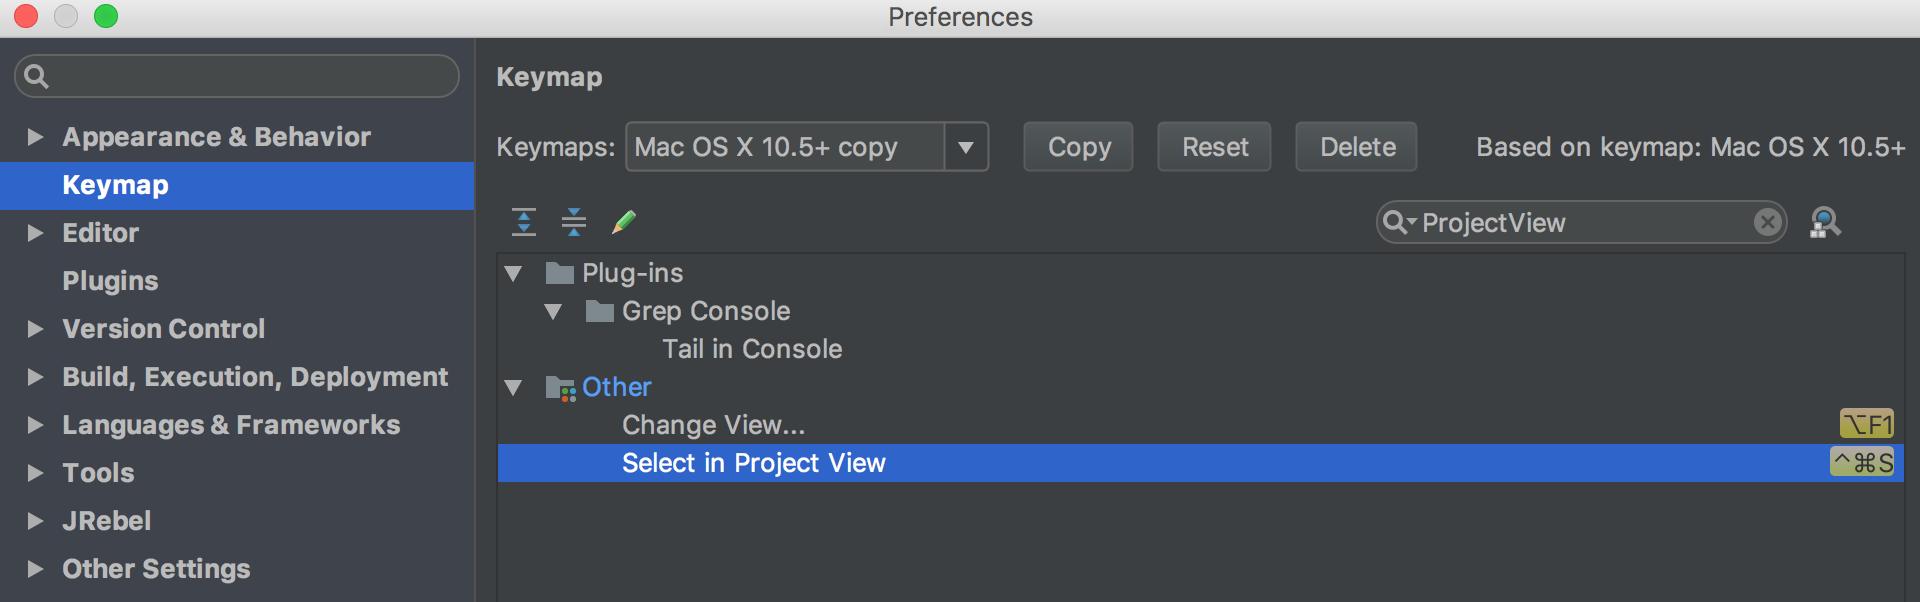 semanticker :: IntelliJ 열린 파일 Project View 에서 확인